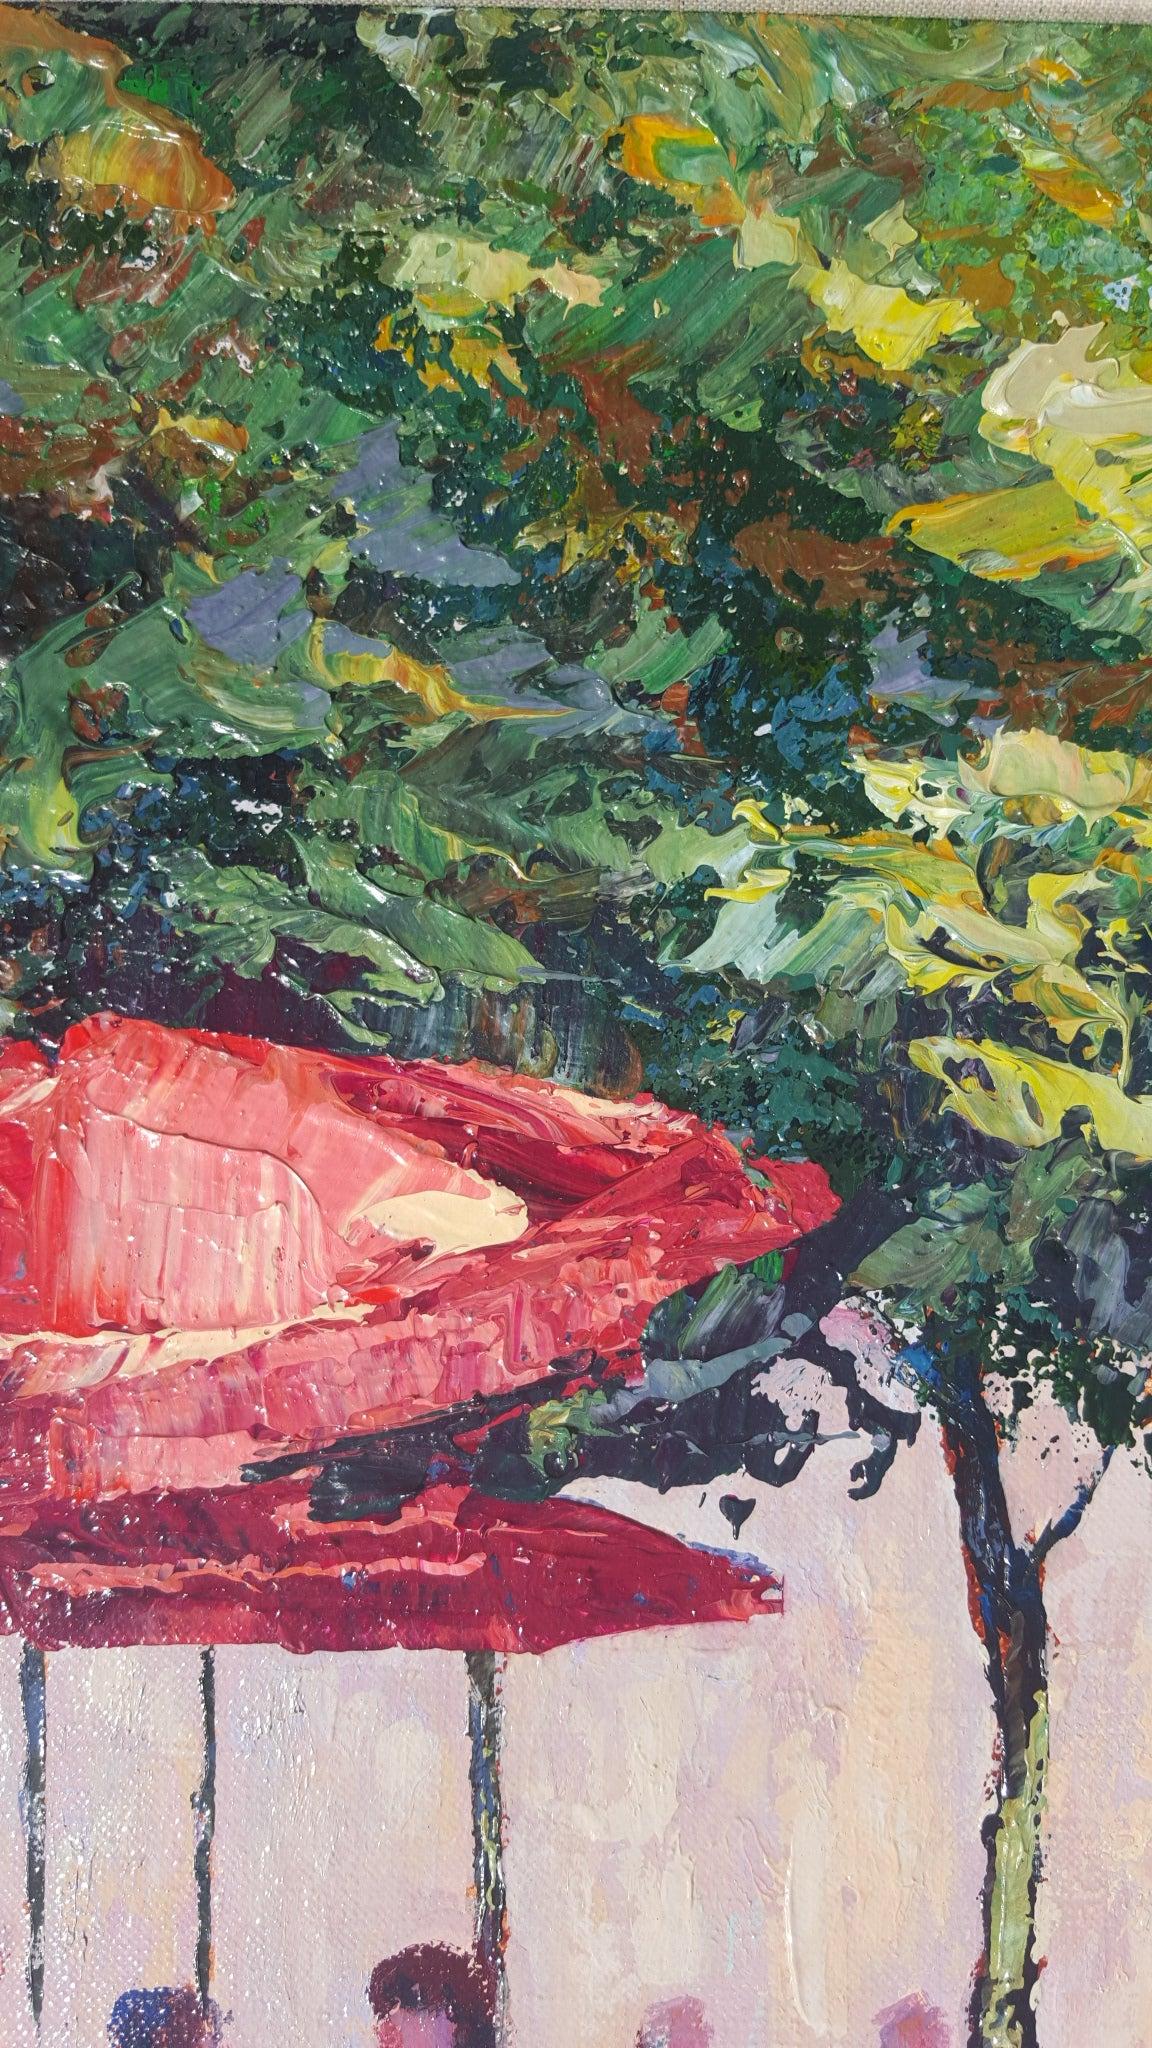 Le Cafe Dans Jardin des Tuileries - Gray Landscape Painting by Mark King